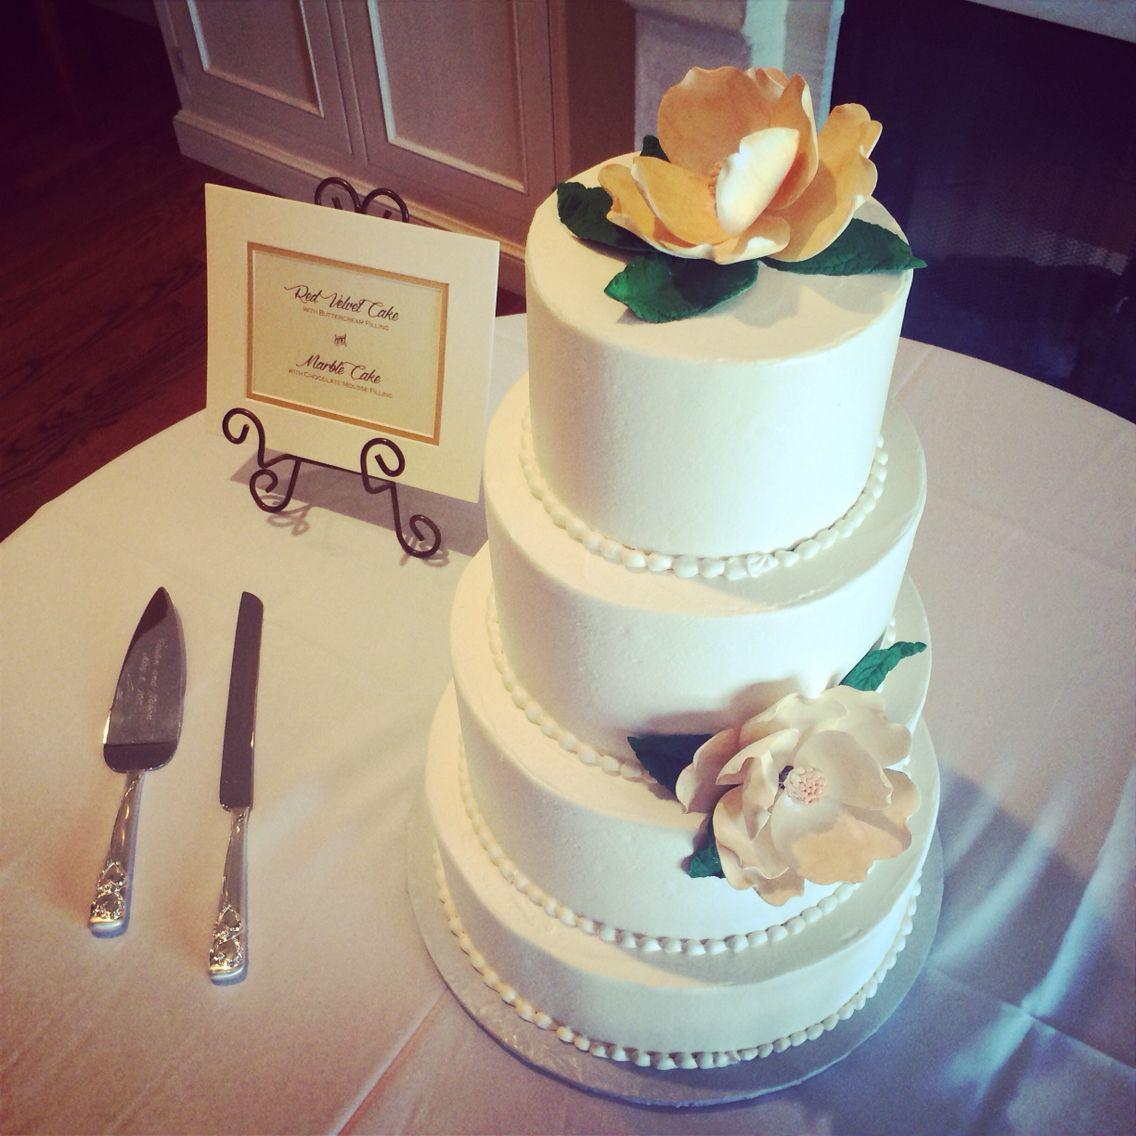 Wedding Cake At Reception Located Lee House In Downtown Pensacola Florida Leehousepensacola